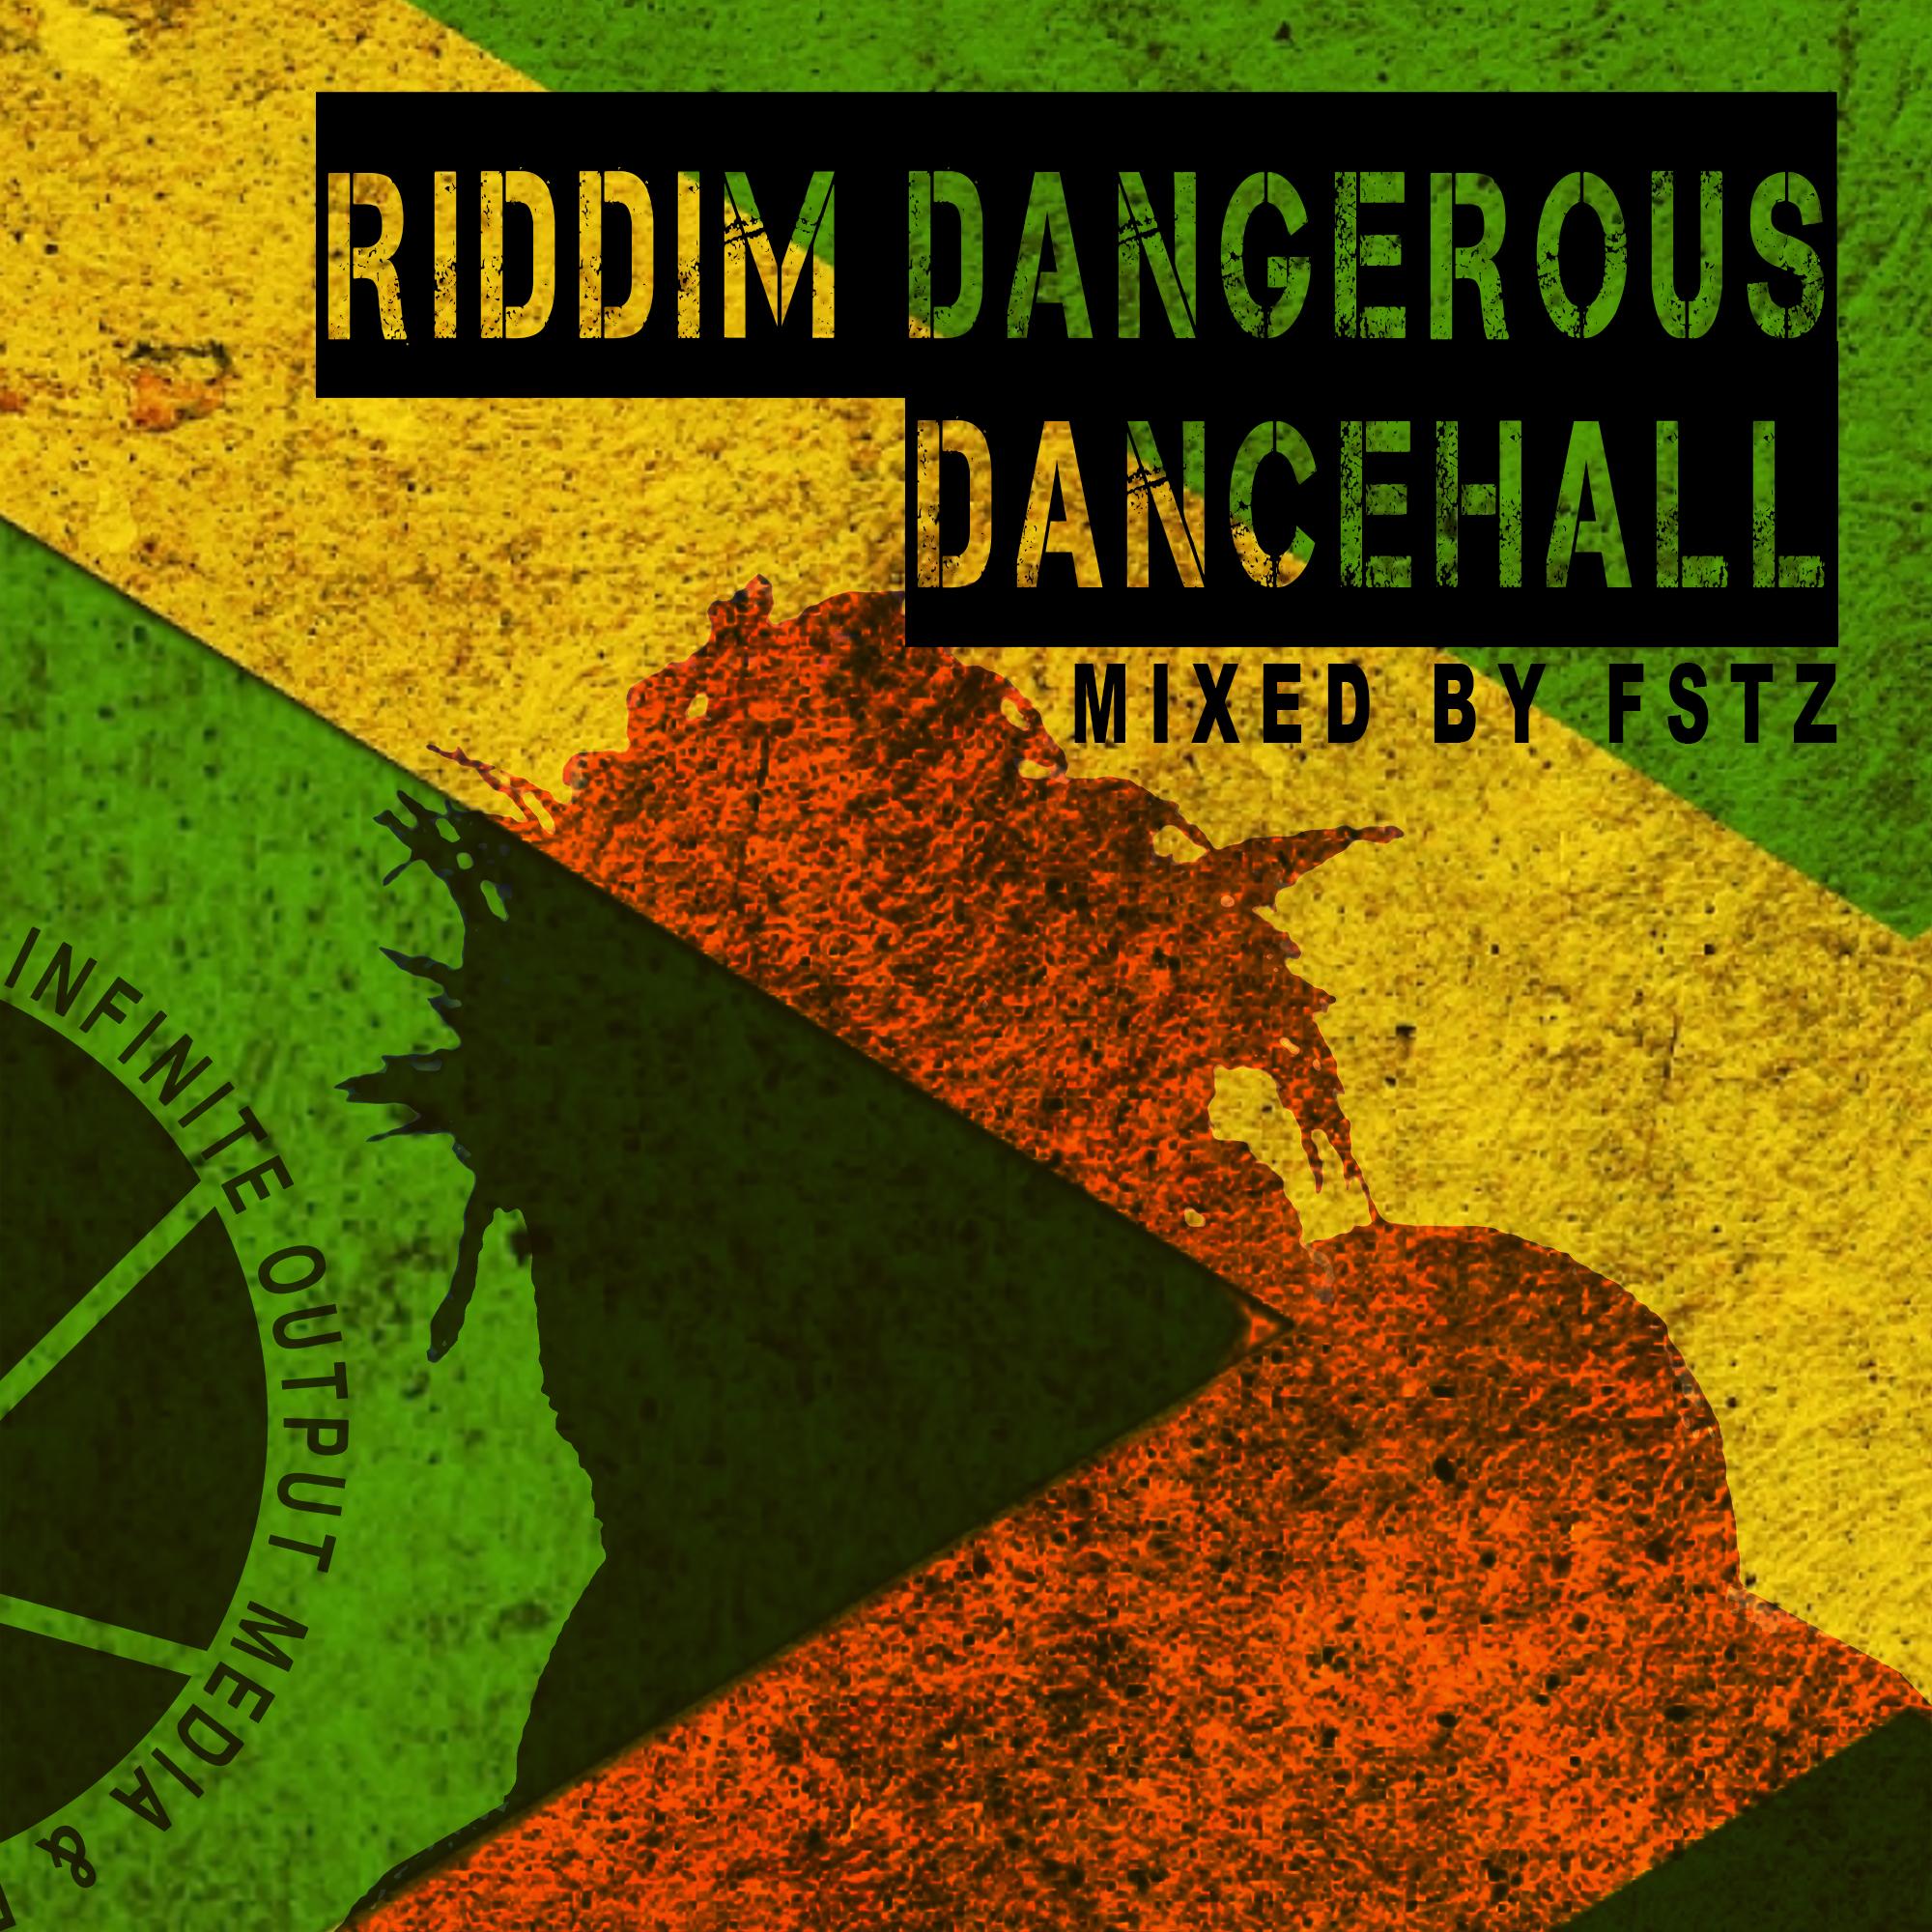 RIDDIM DANGEROUS DANCEHALL